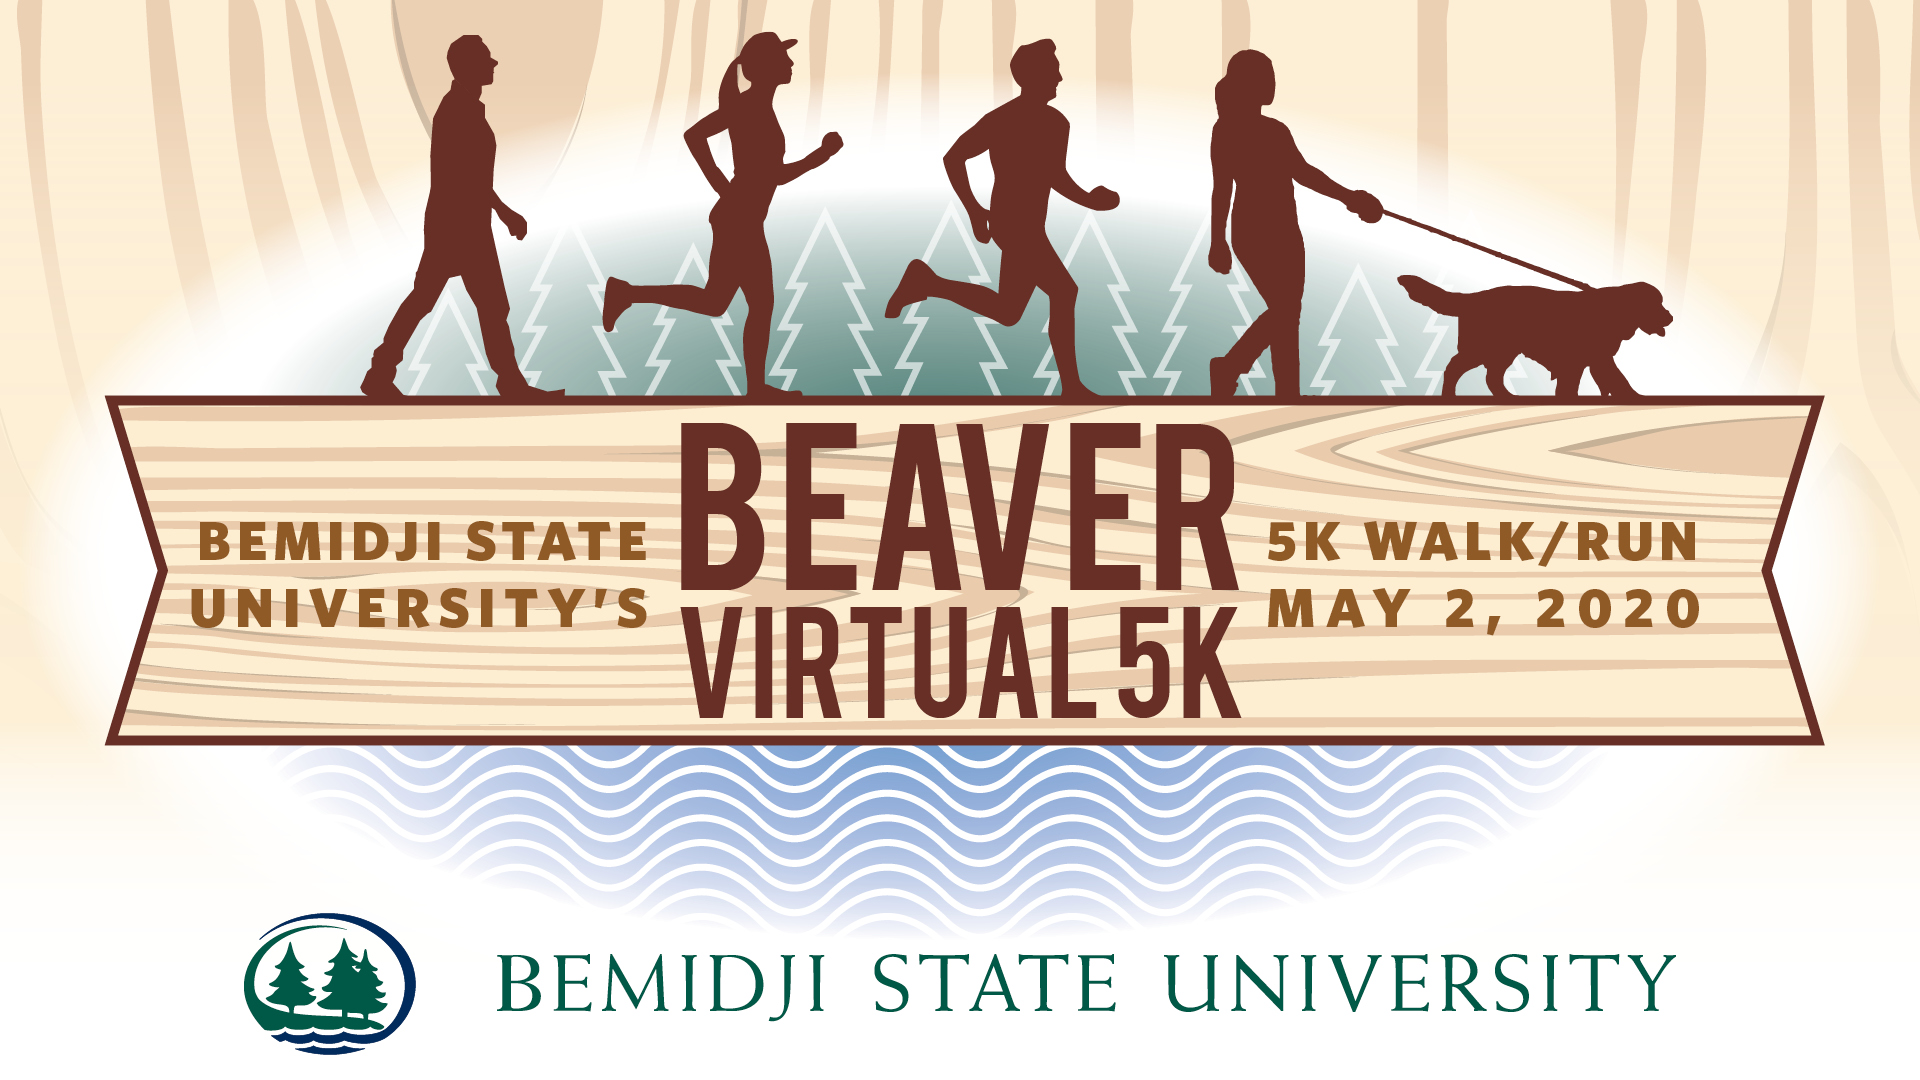 BSU_Virtual 5K_FBcover